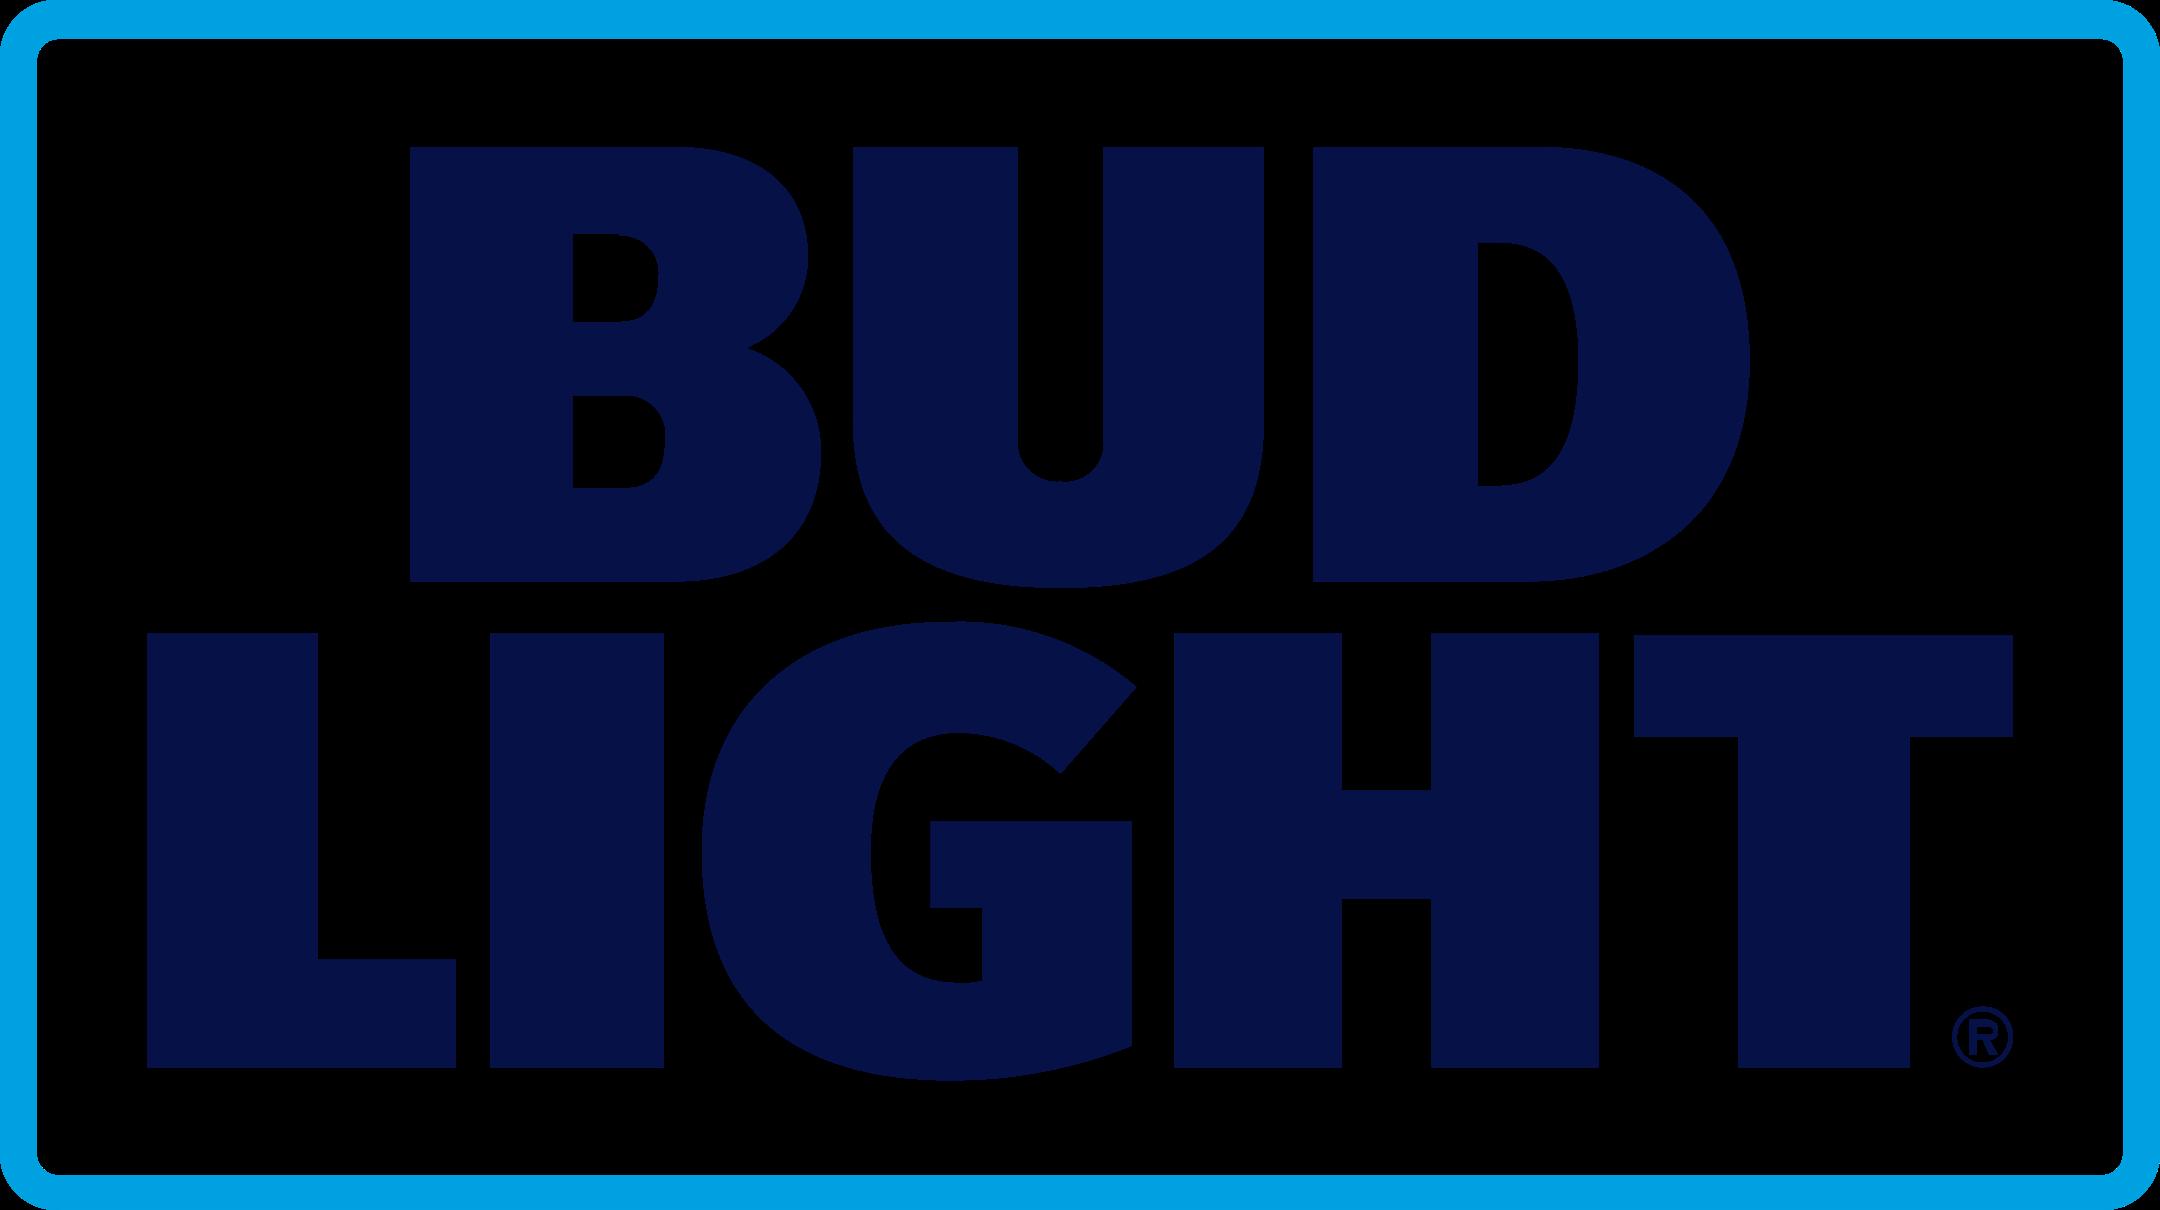 bud light logo 1 - Bud Light Logo